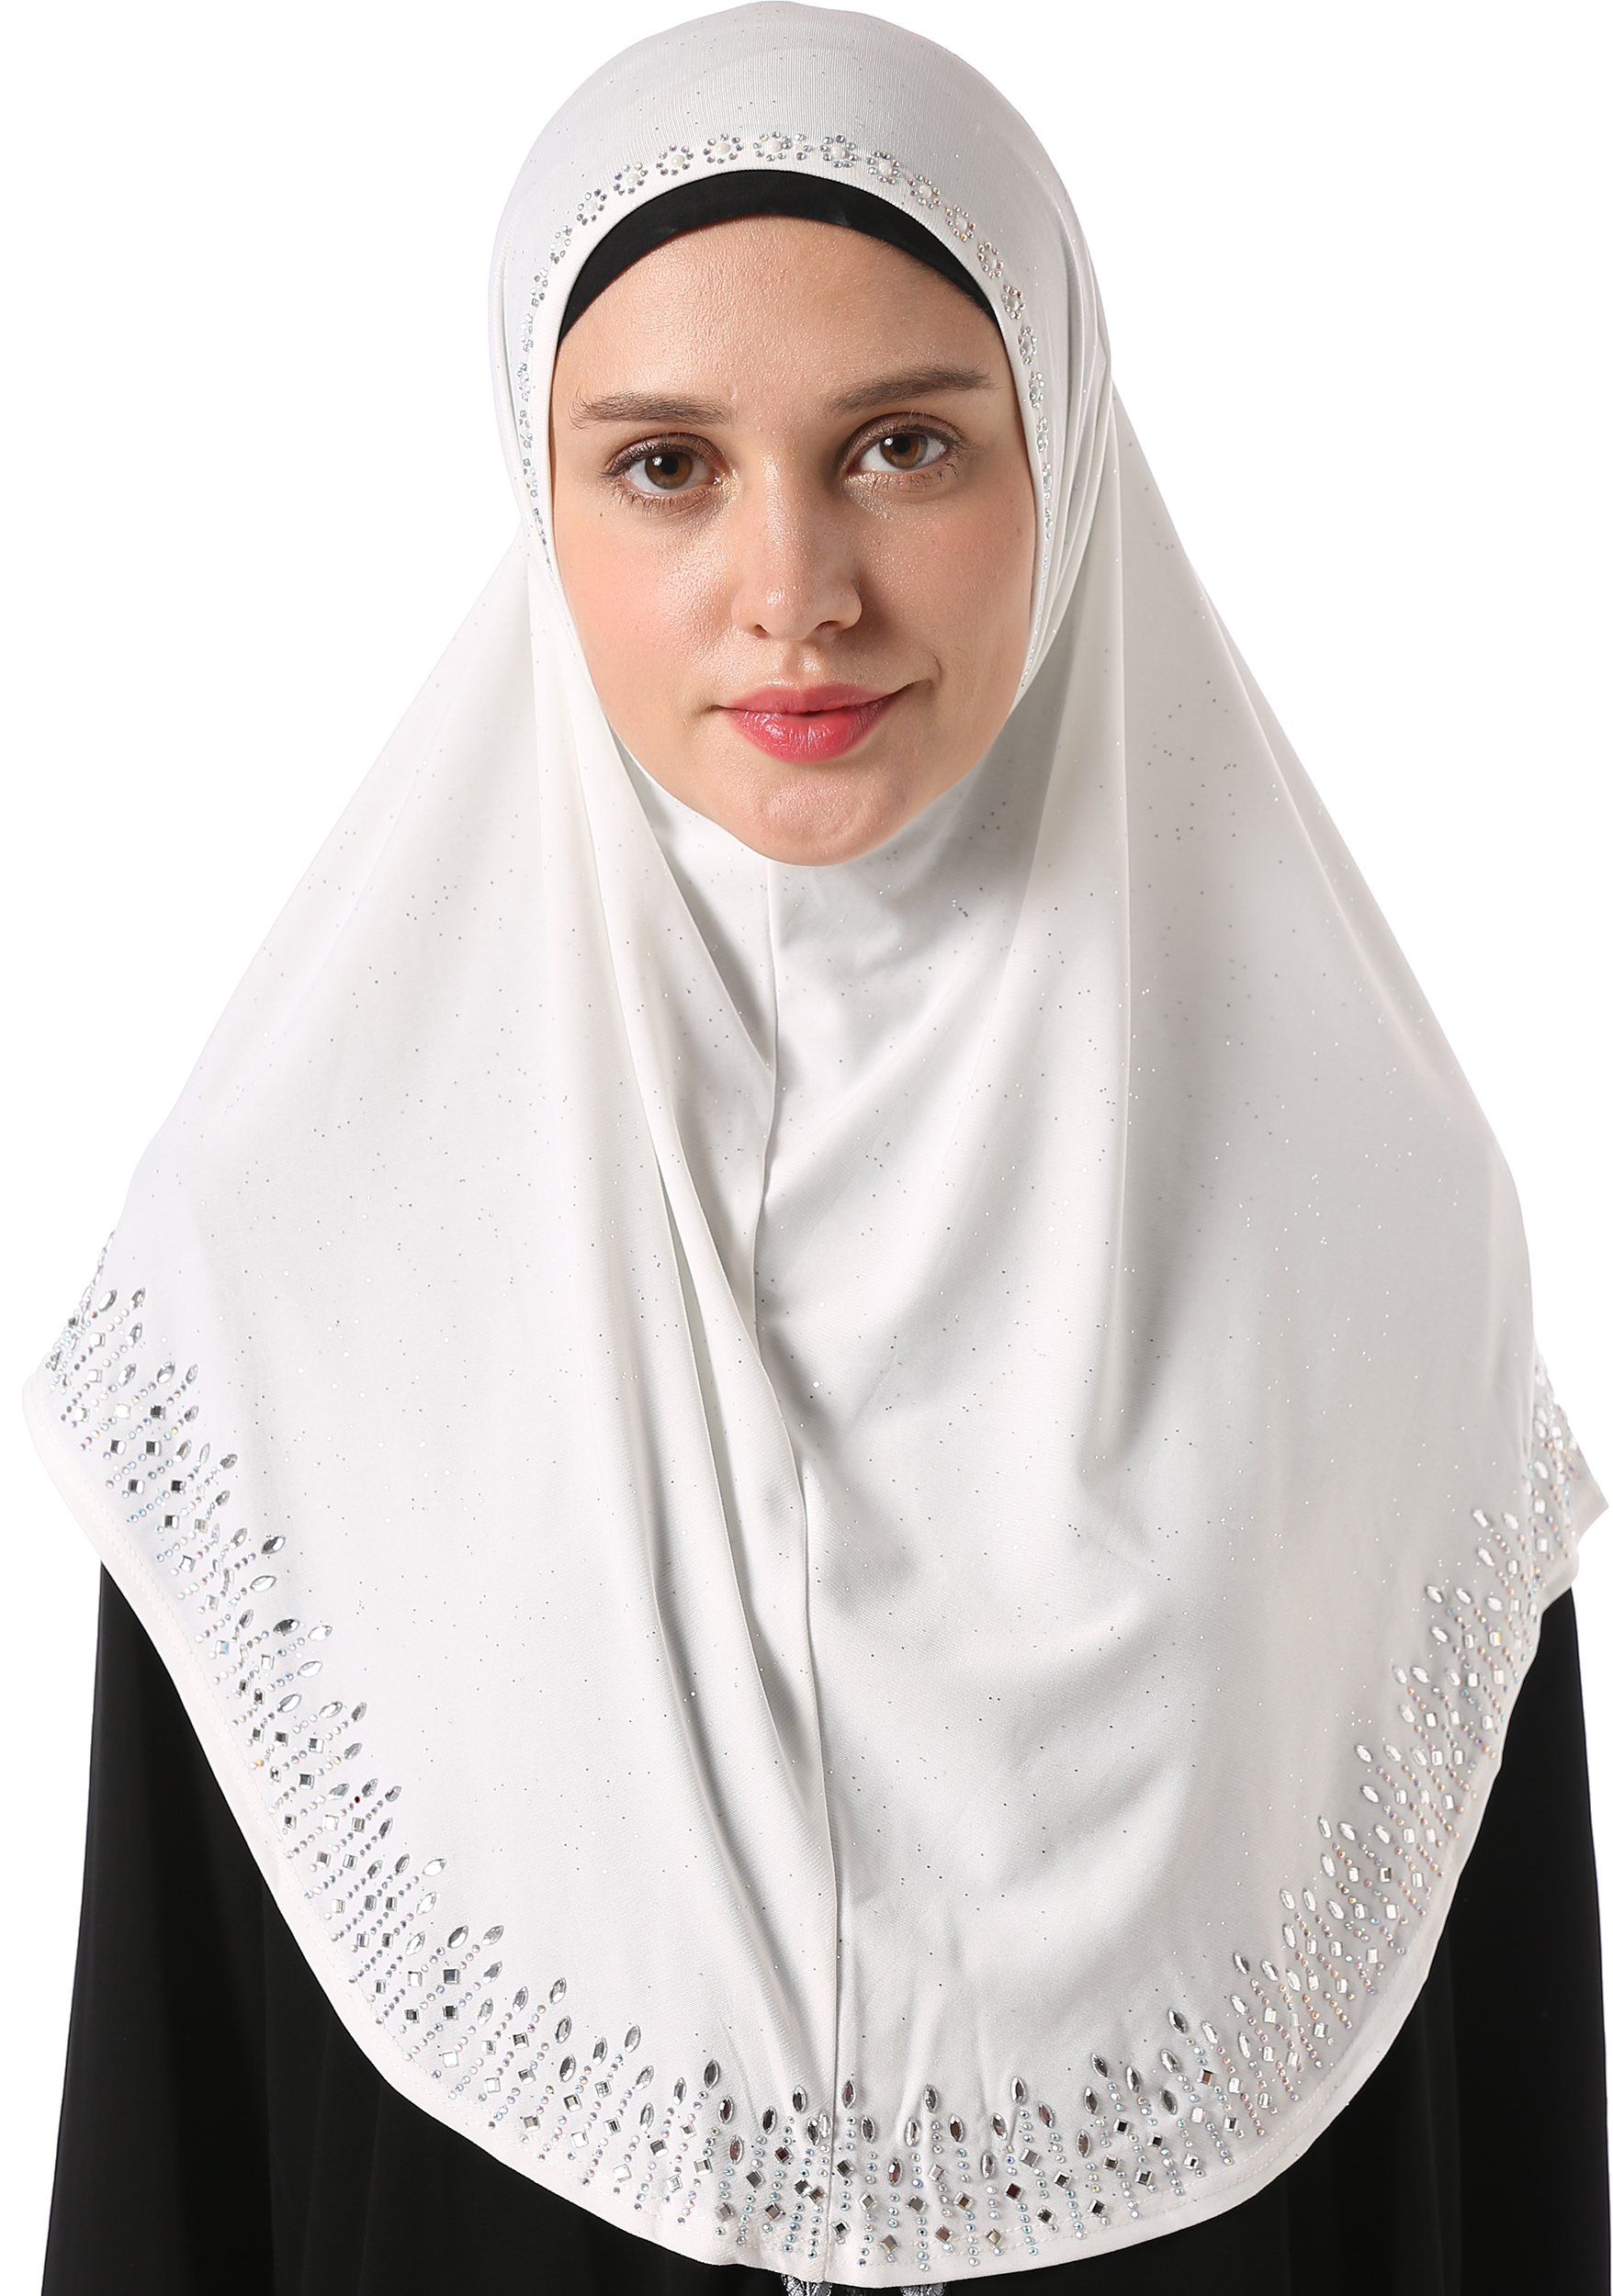 YI HENG MEI Women's Modest Muslim Rhinestones Instant Hijab Jersey Headscarf Ready to Wear Hijab,White